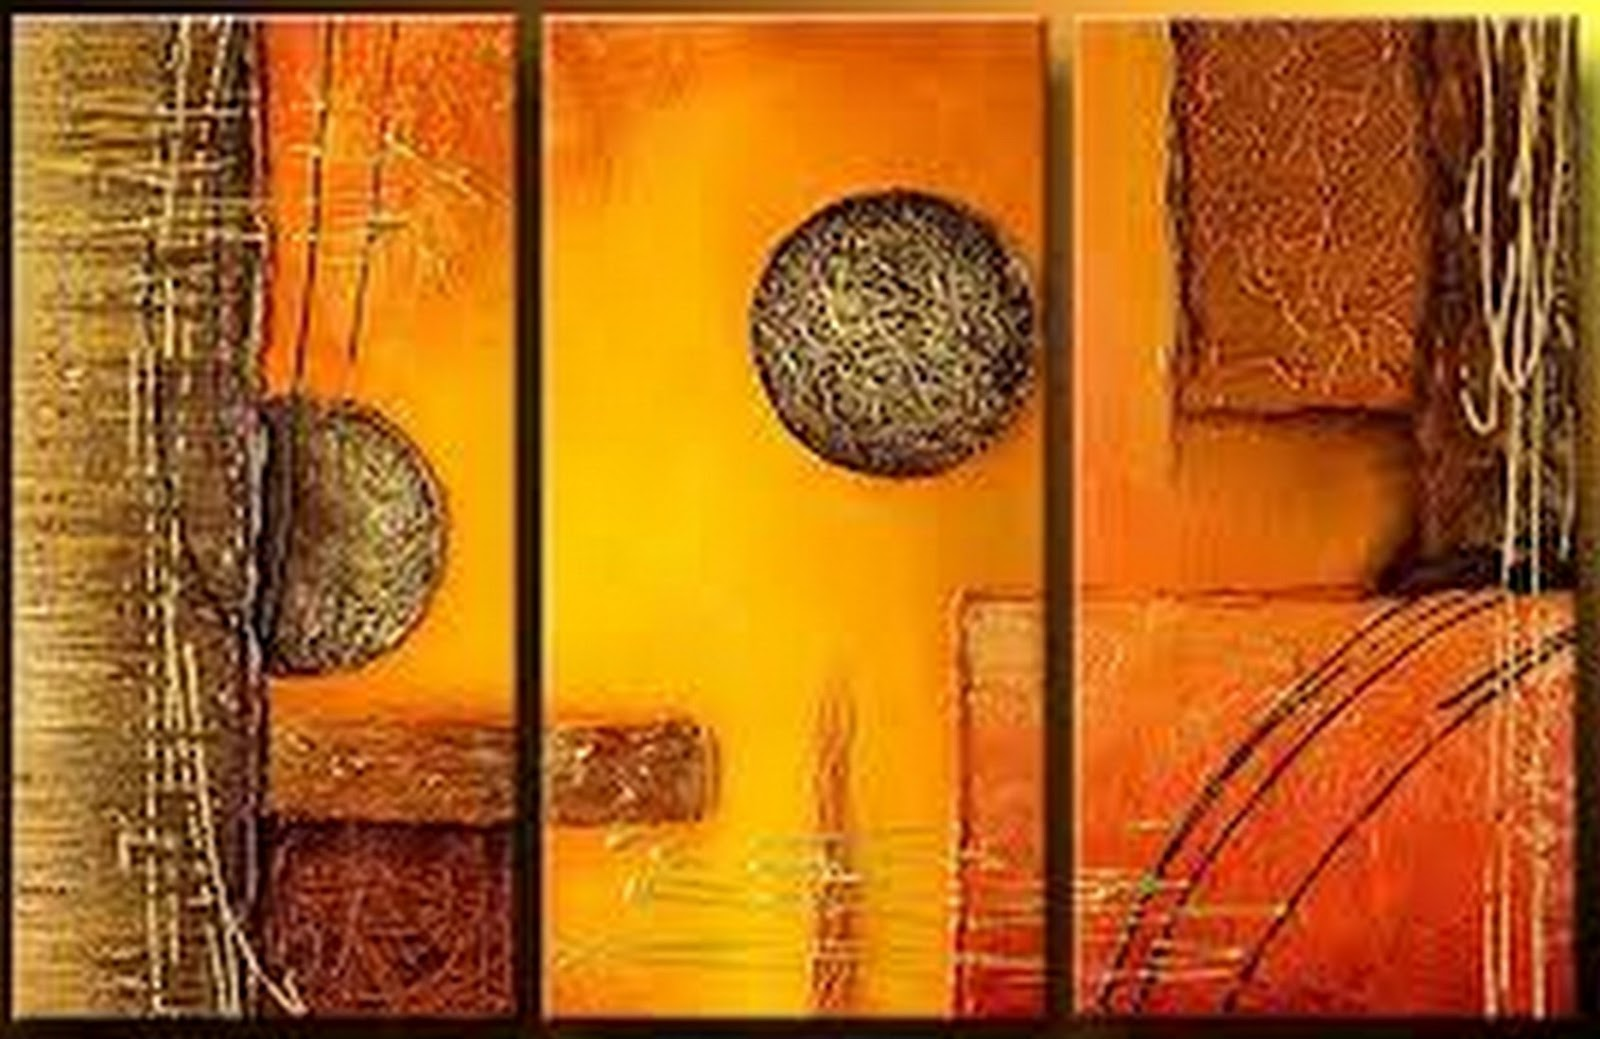 Pintura moderna y fotograf a art stica pinturas al leo f ciles - Como pintar cuadros faciles ...